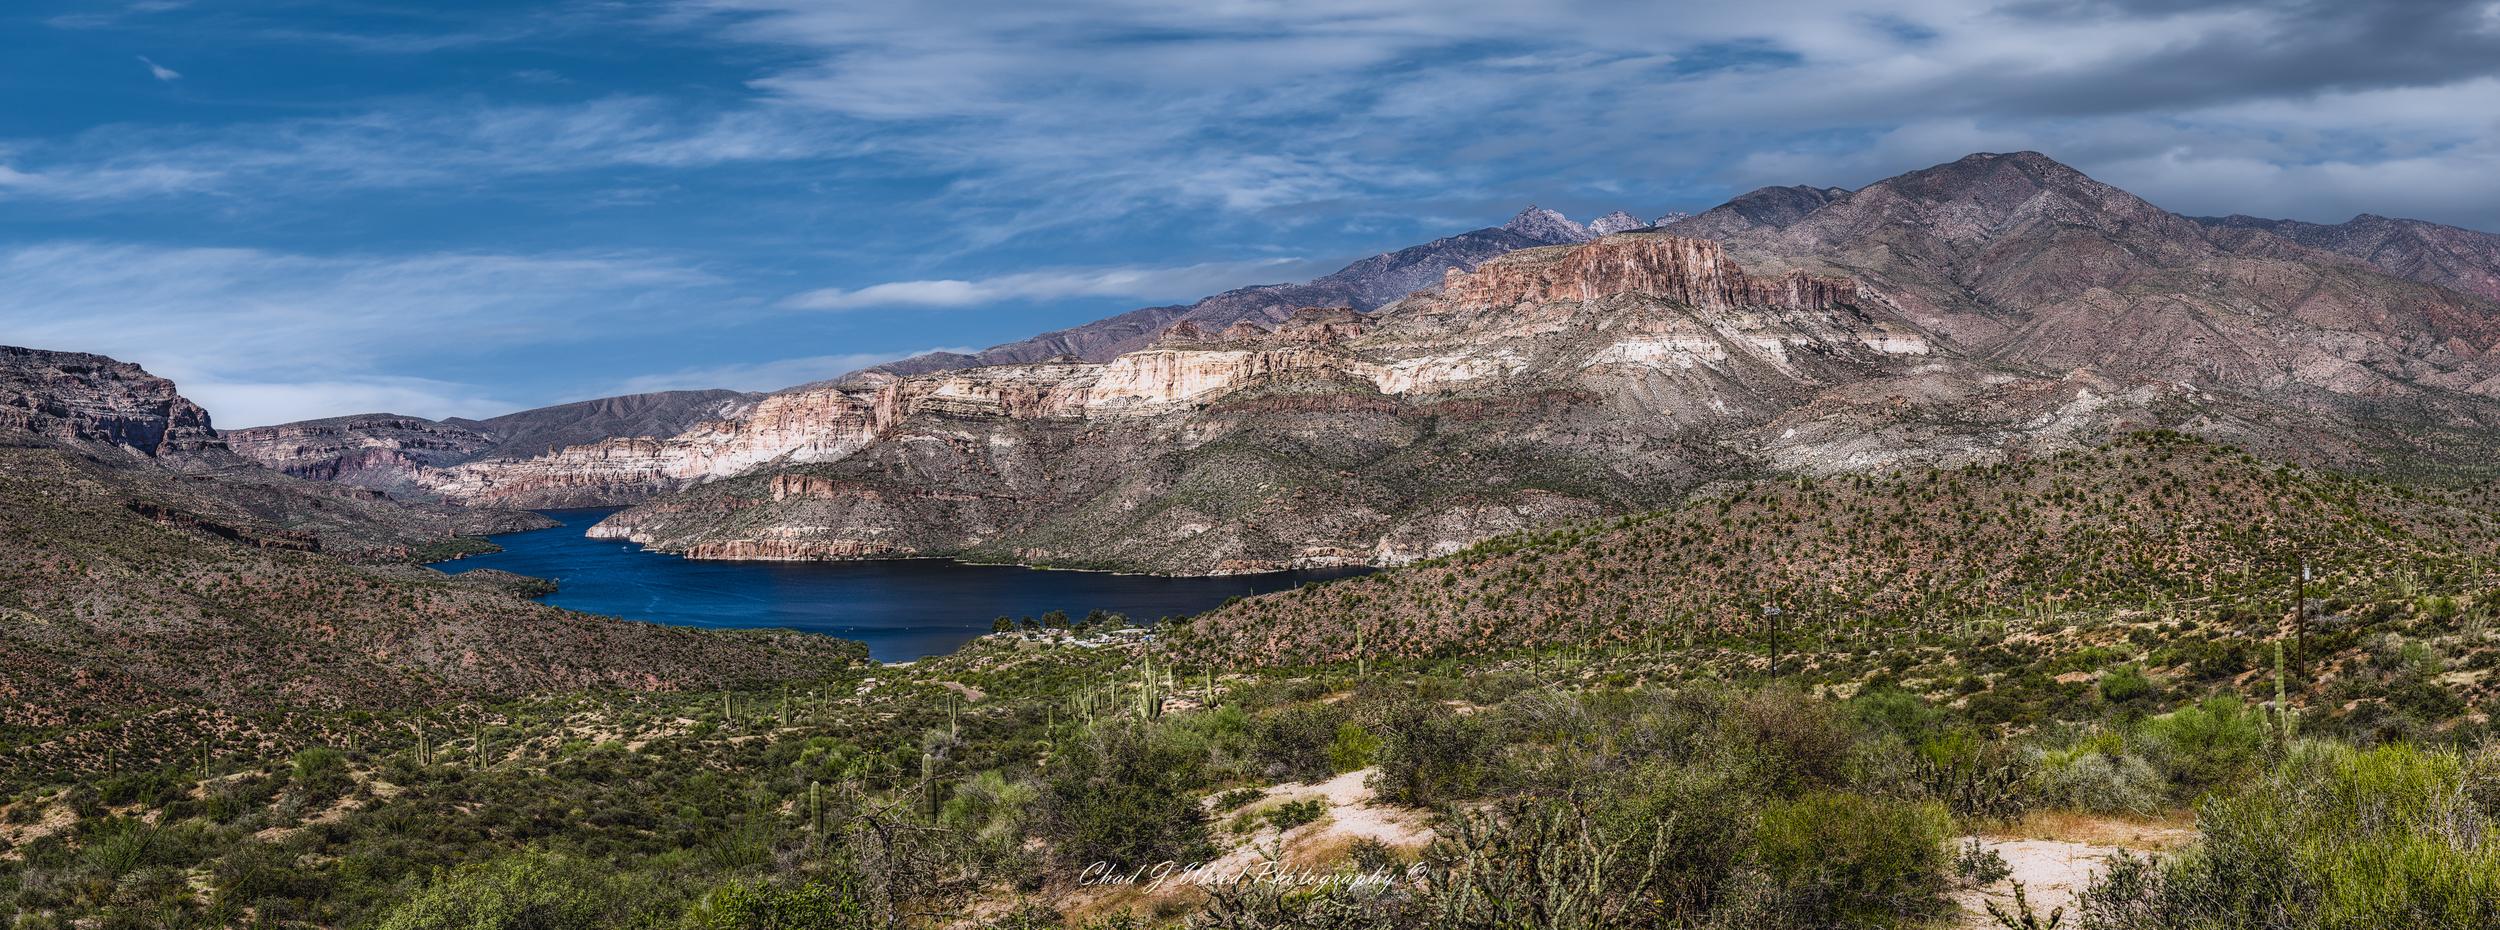 Apache Lake.jpg